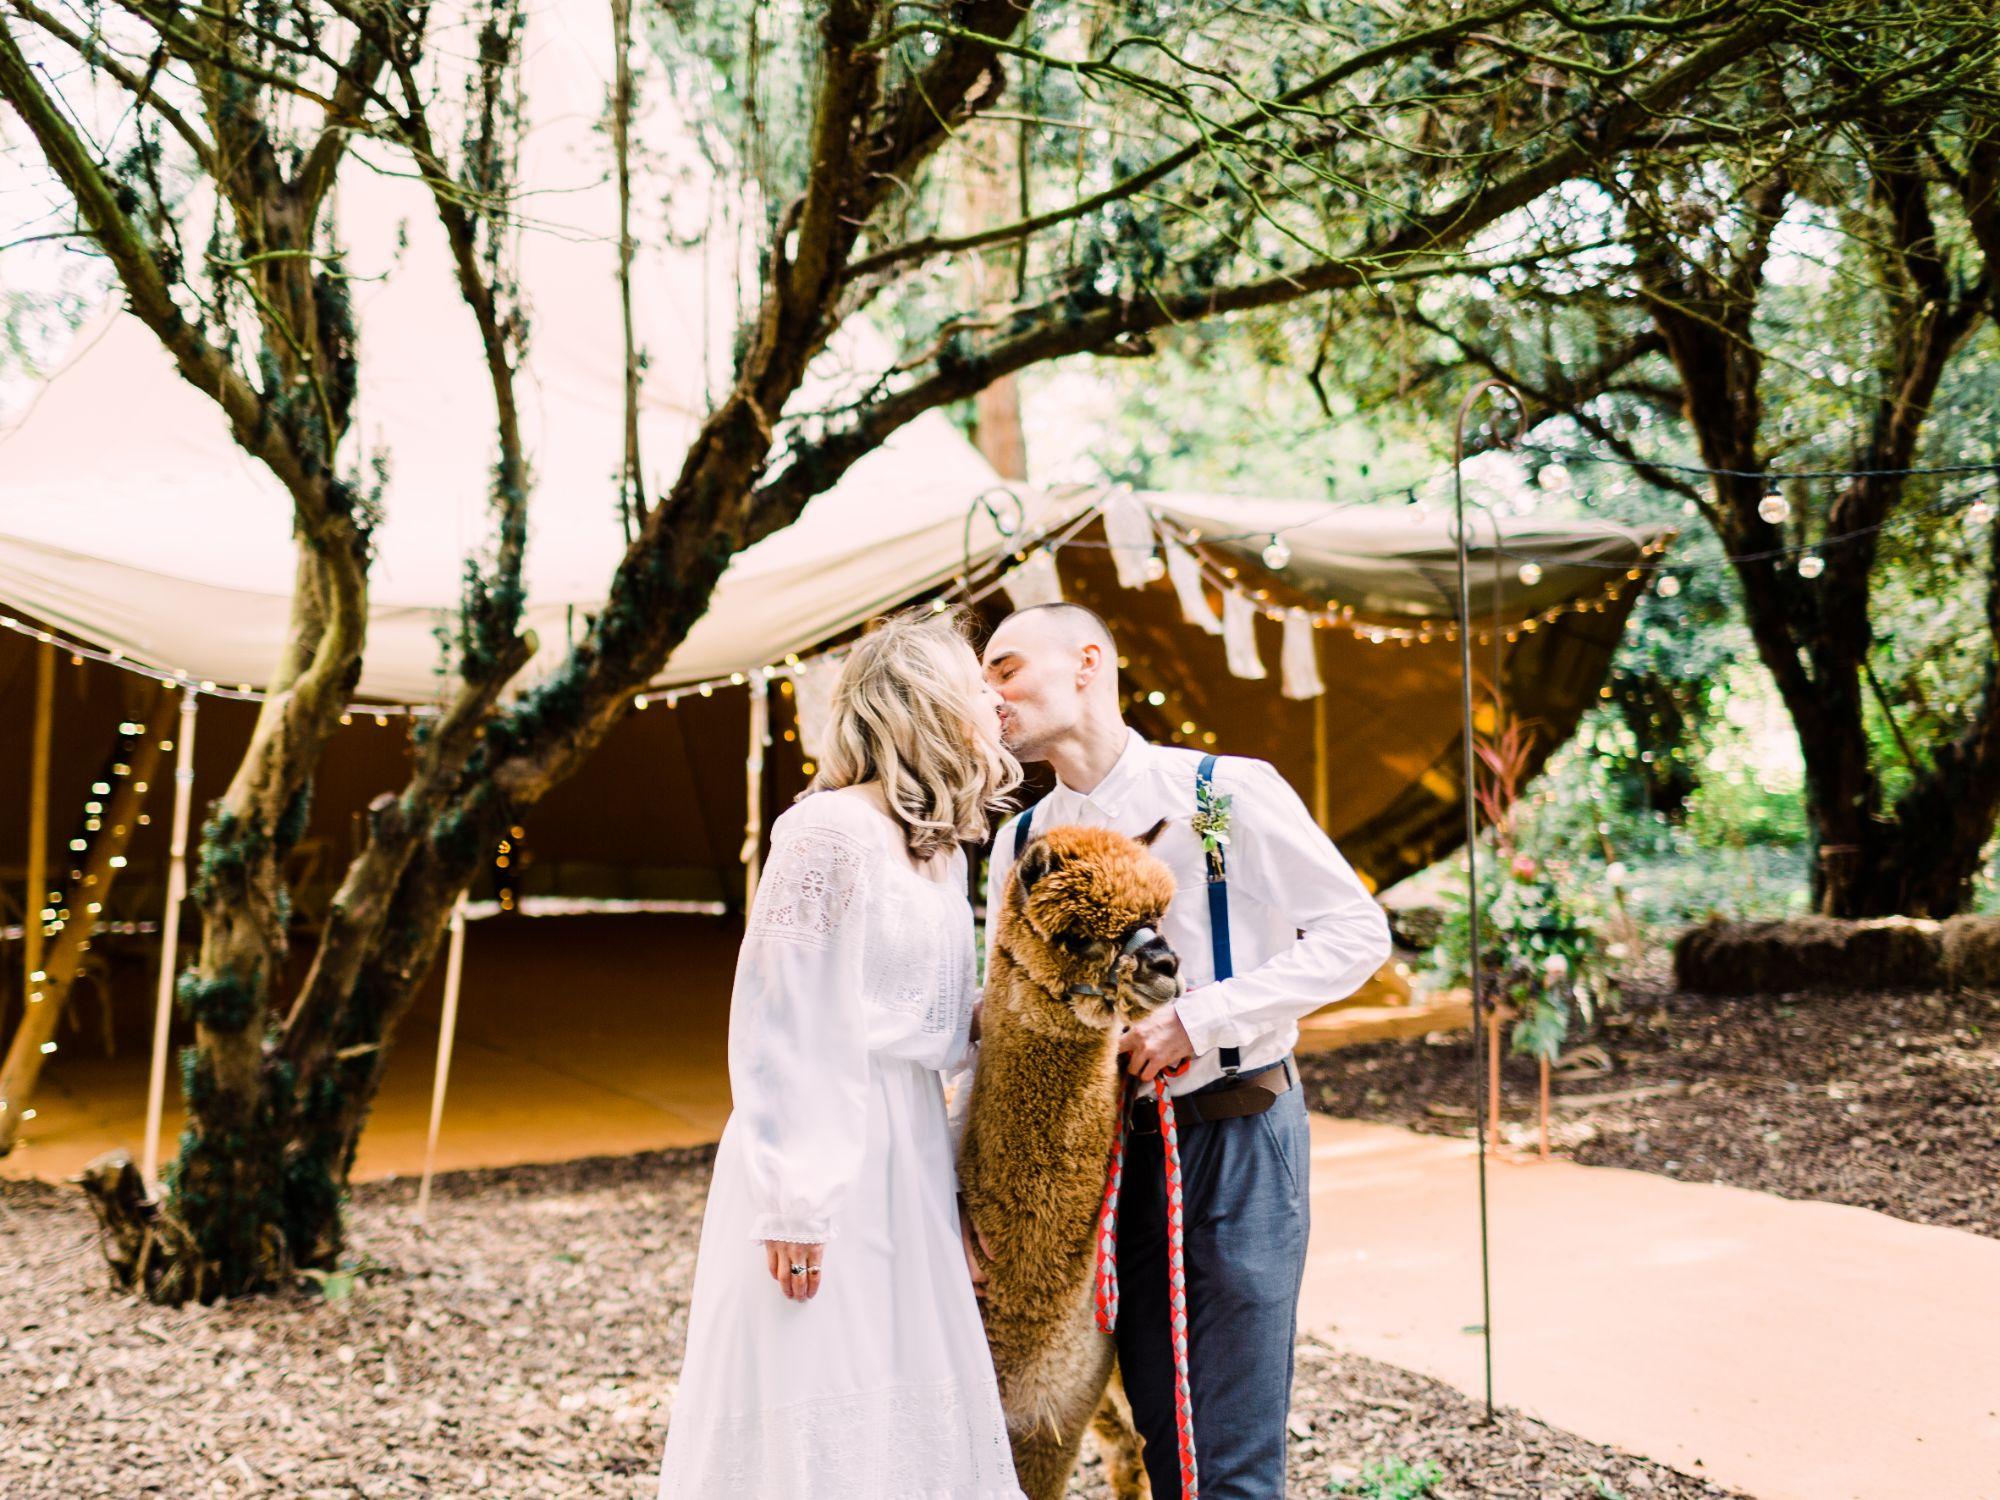 Wedding_Photography_Becky_Tranter_-4.JPG